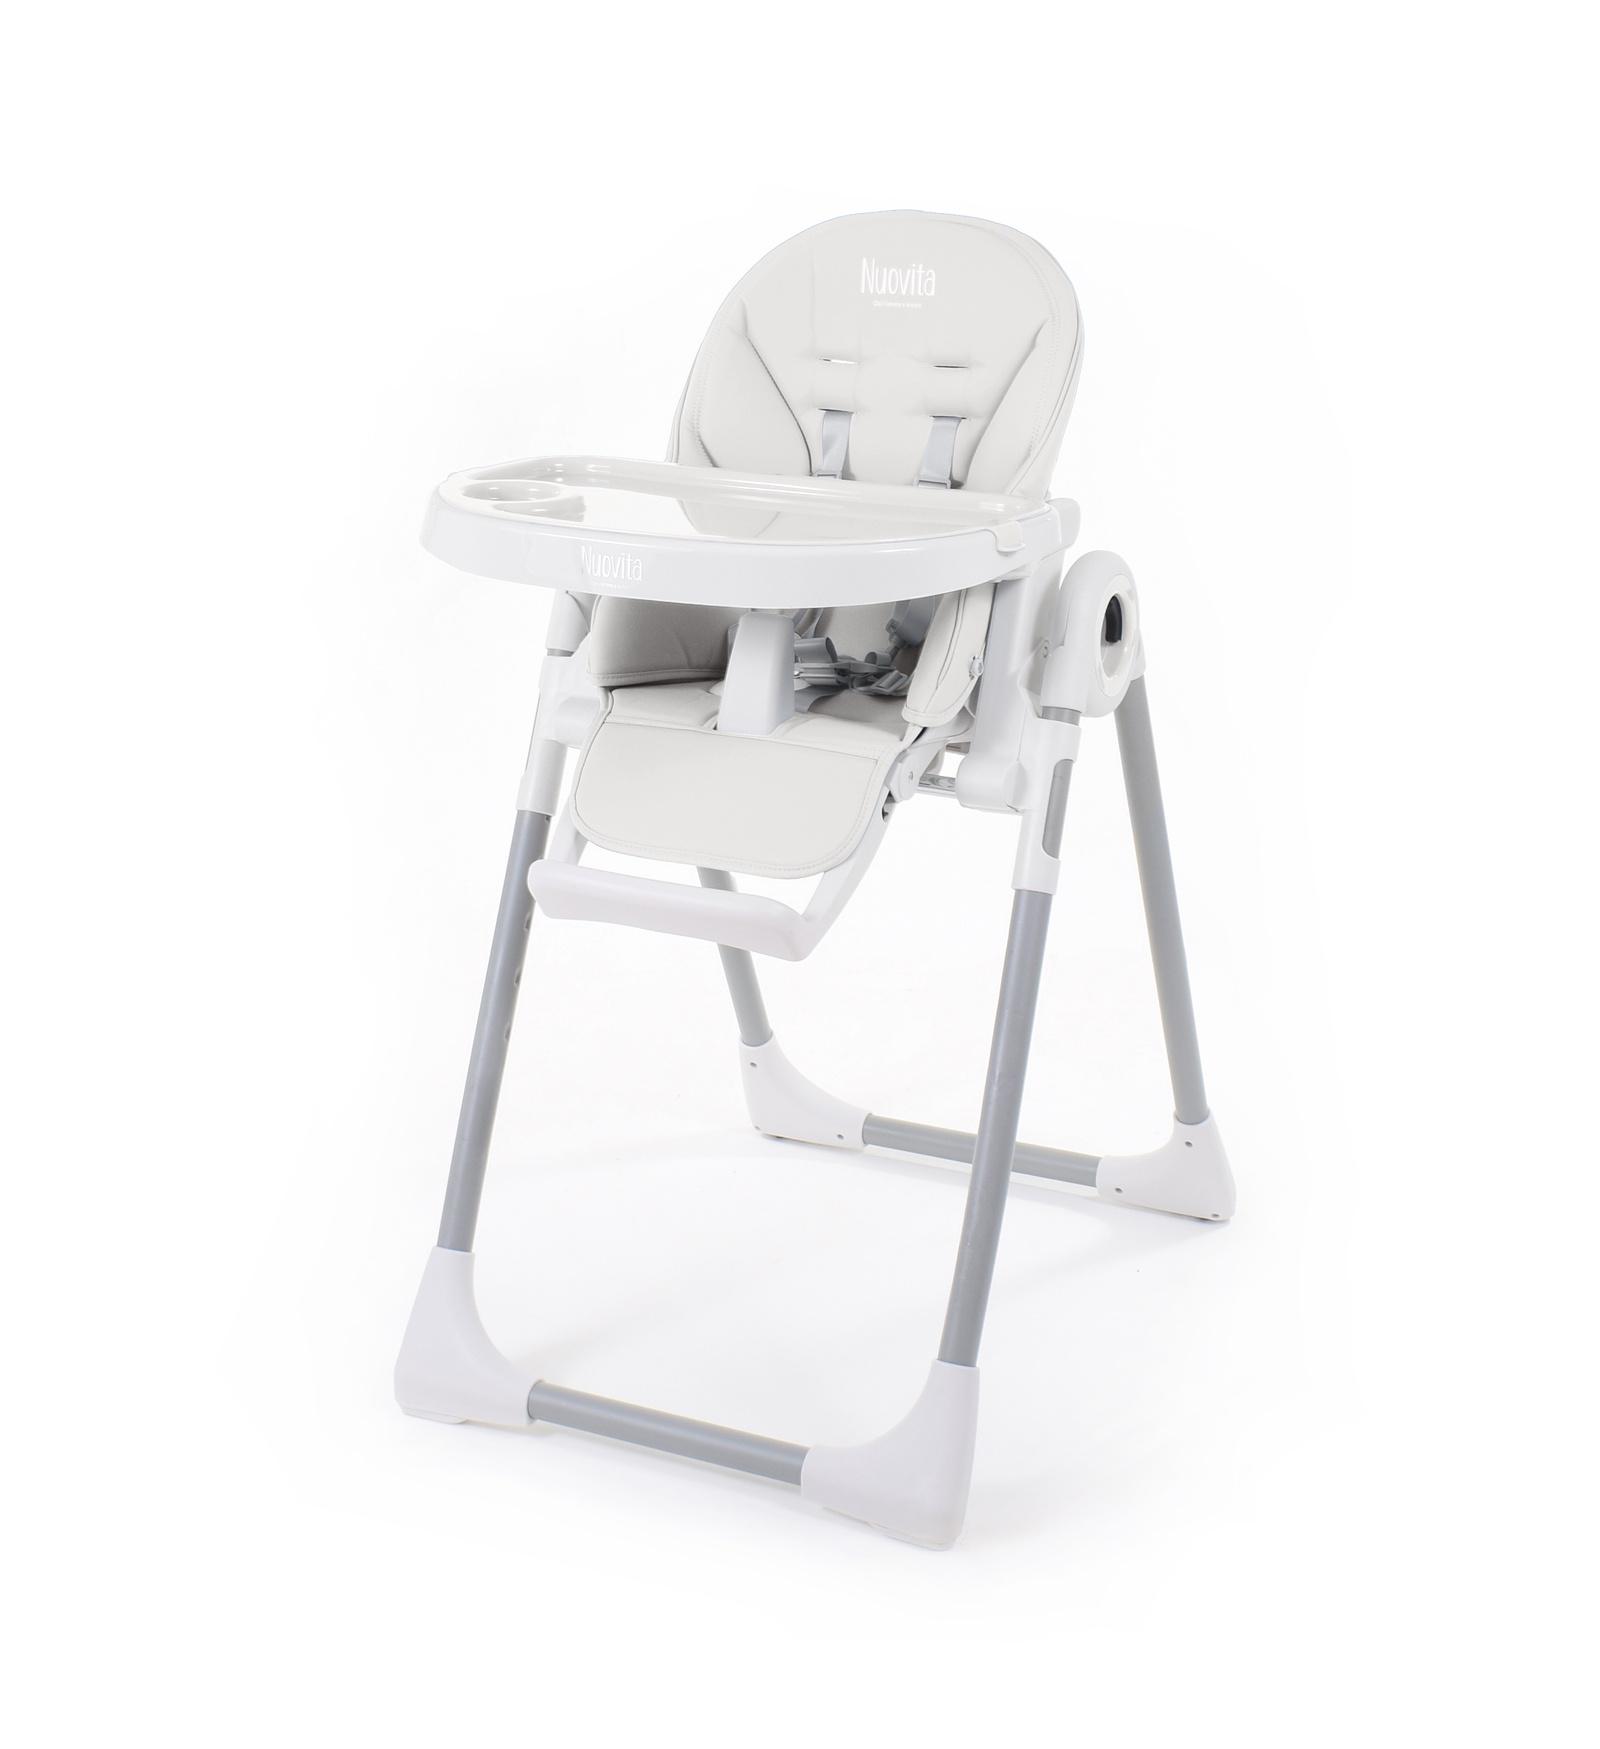 Стульчик для кормления Nuovita Стульчик для кормления Grande стульчик для кормления nuovita grande corallo